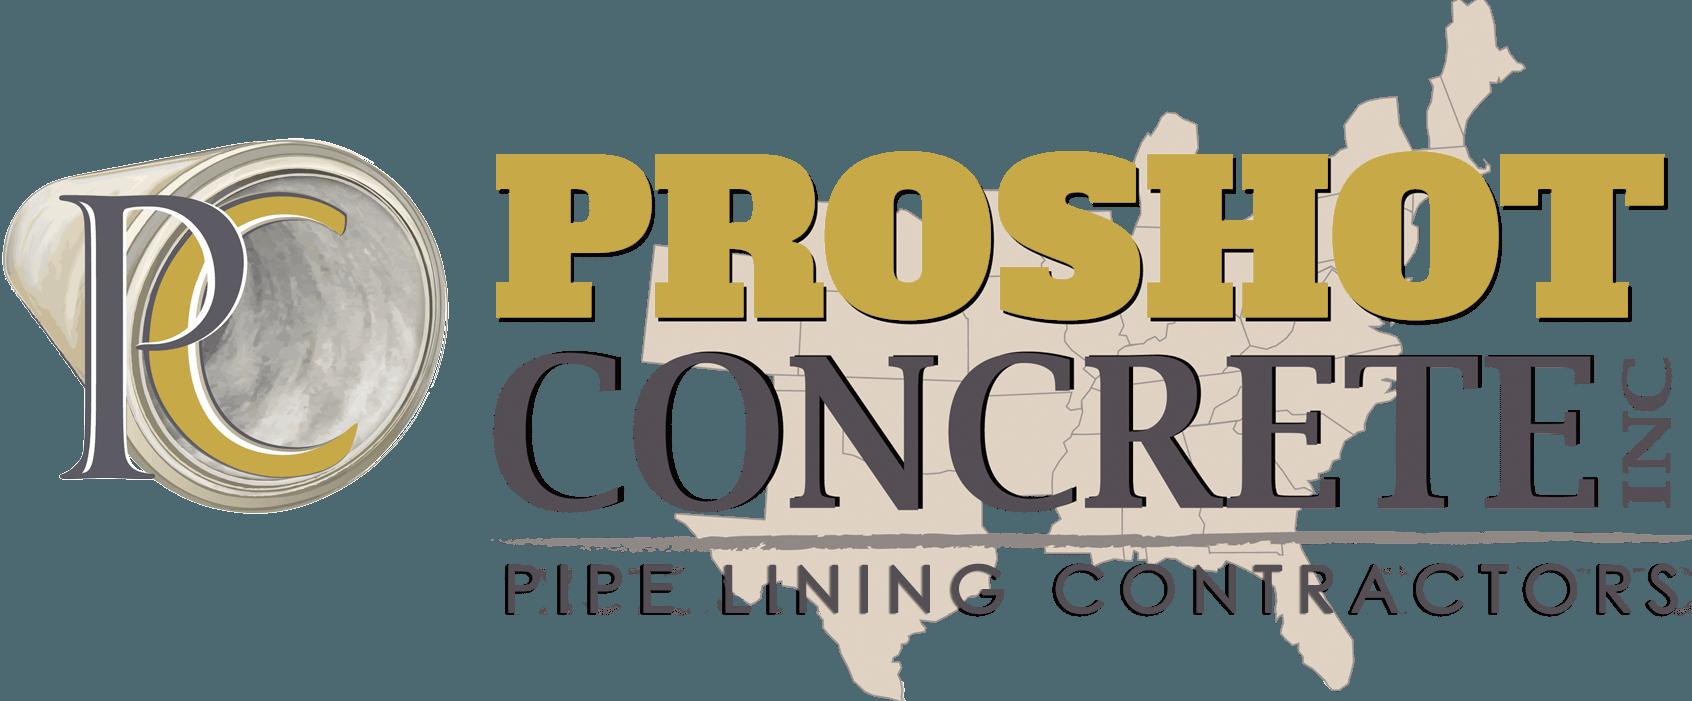 Proshot Concrete Inc.